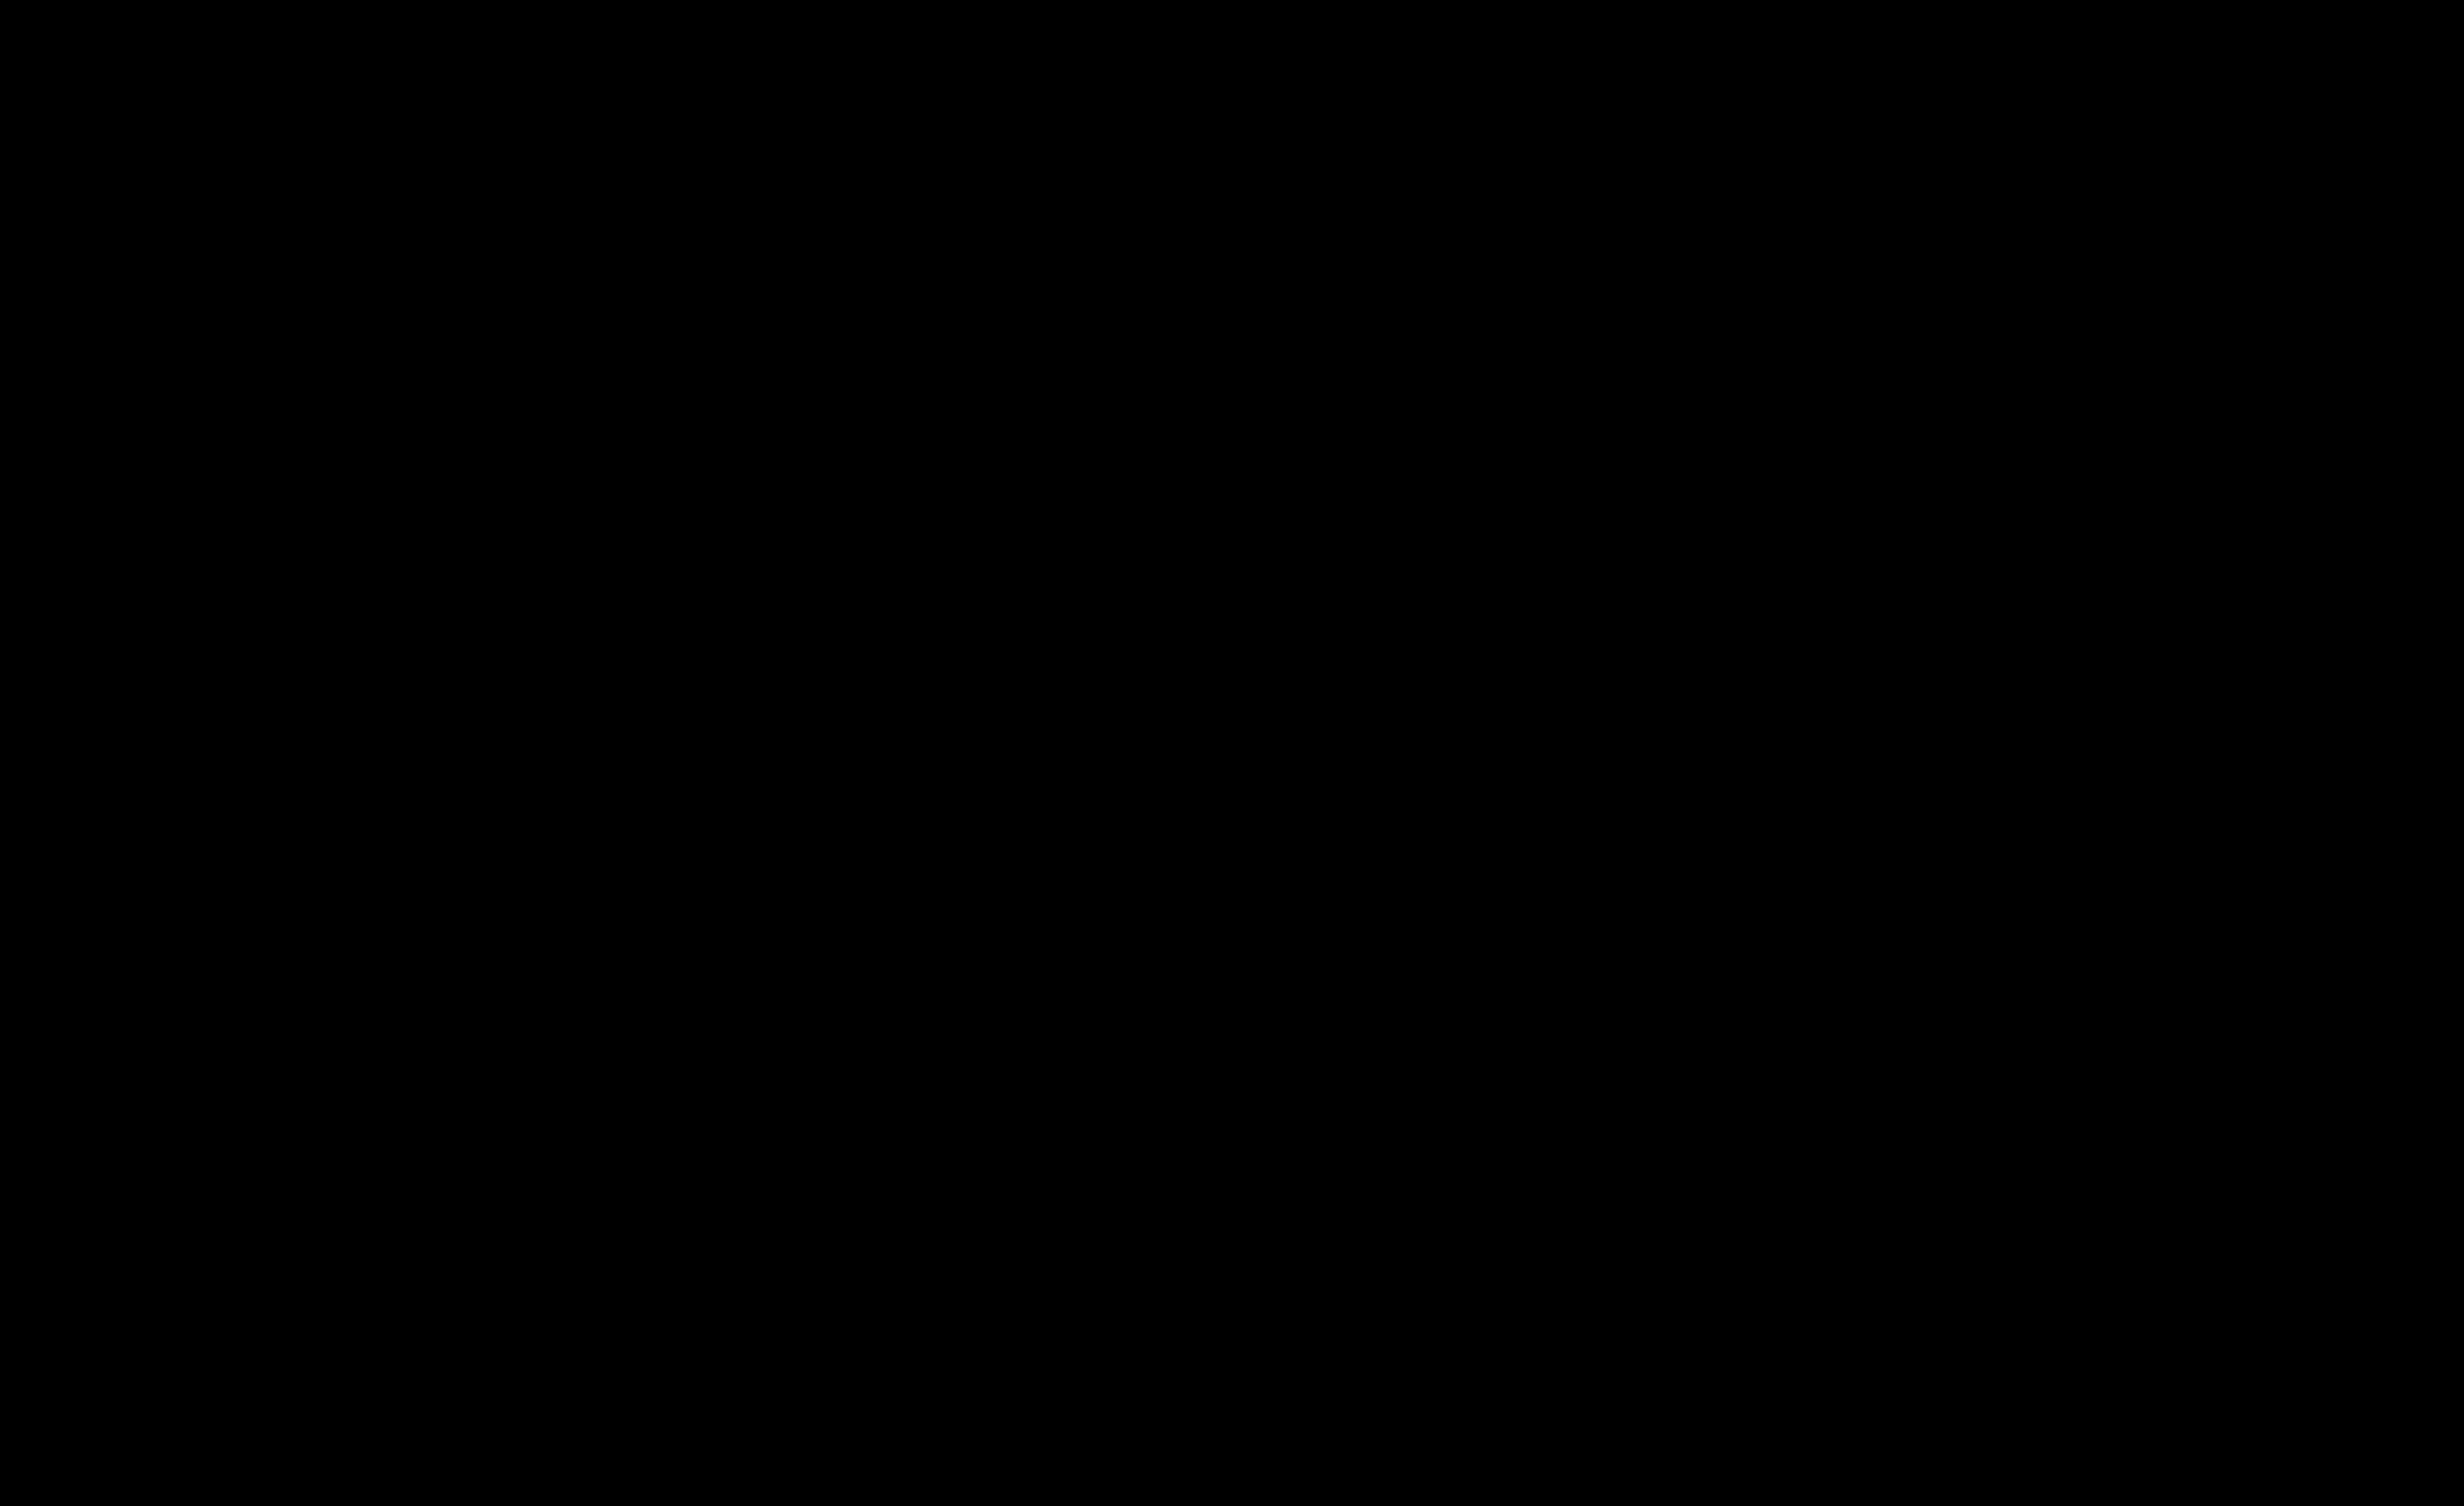 _2BP9816_A